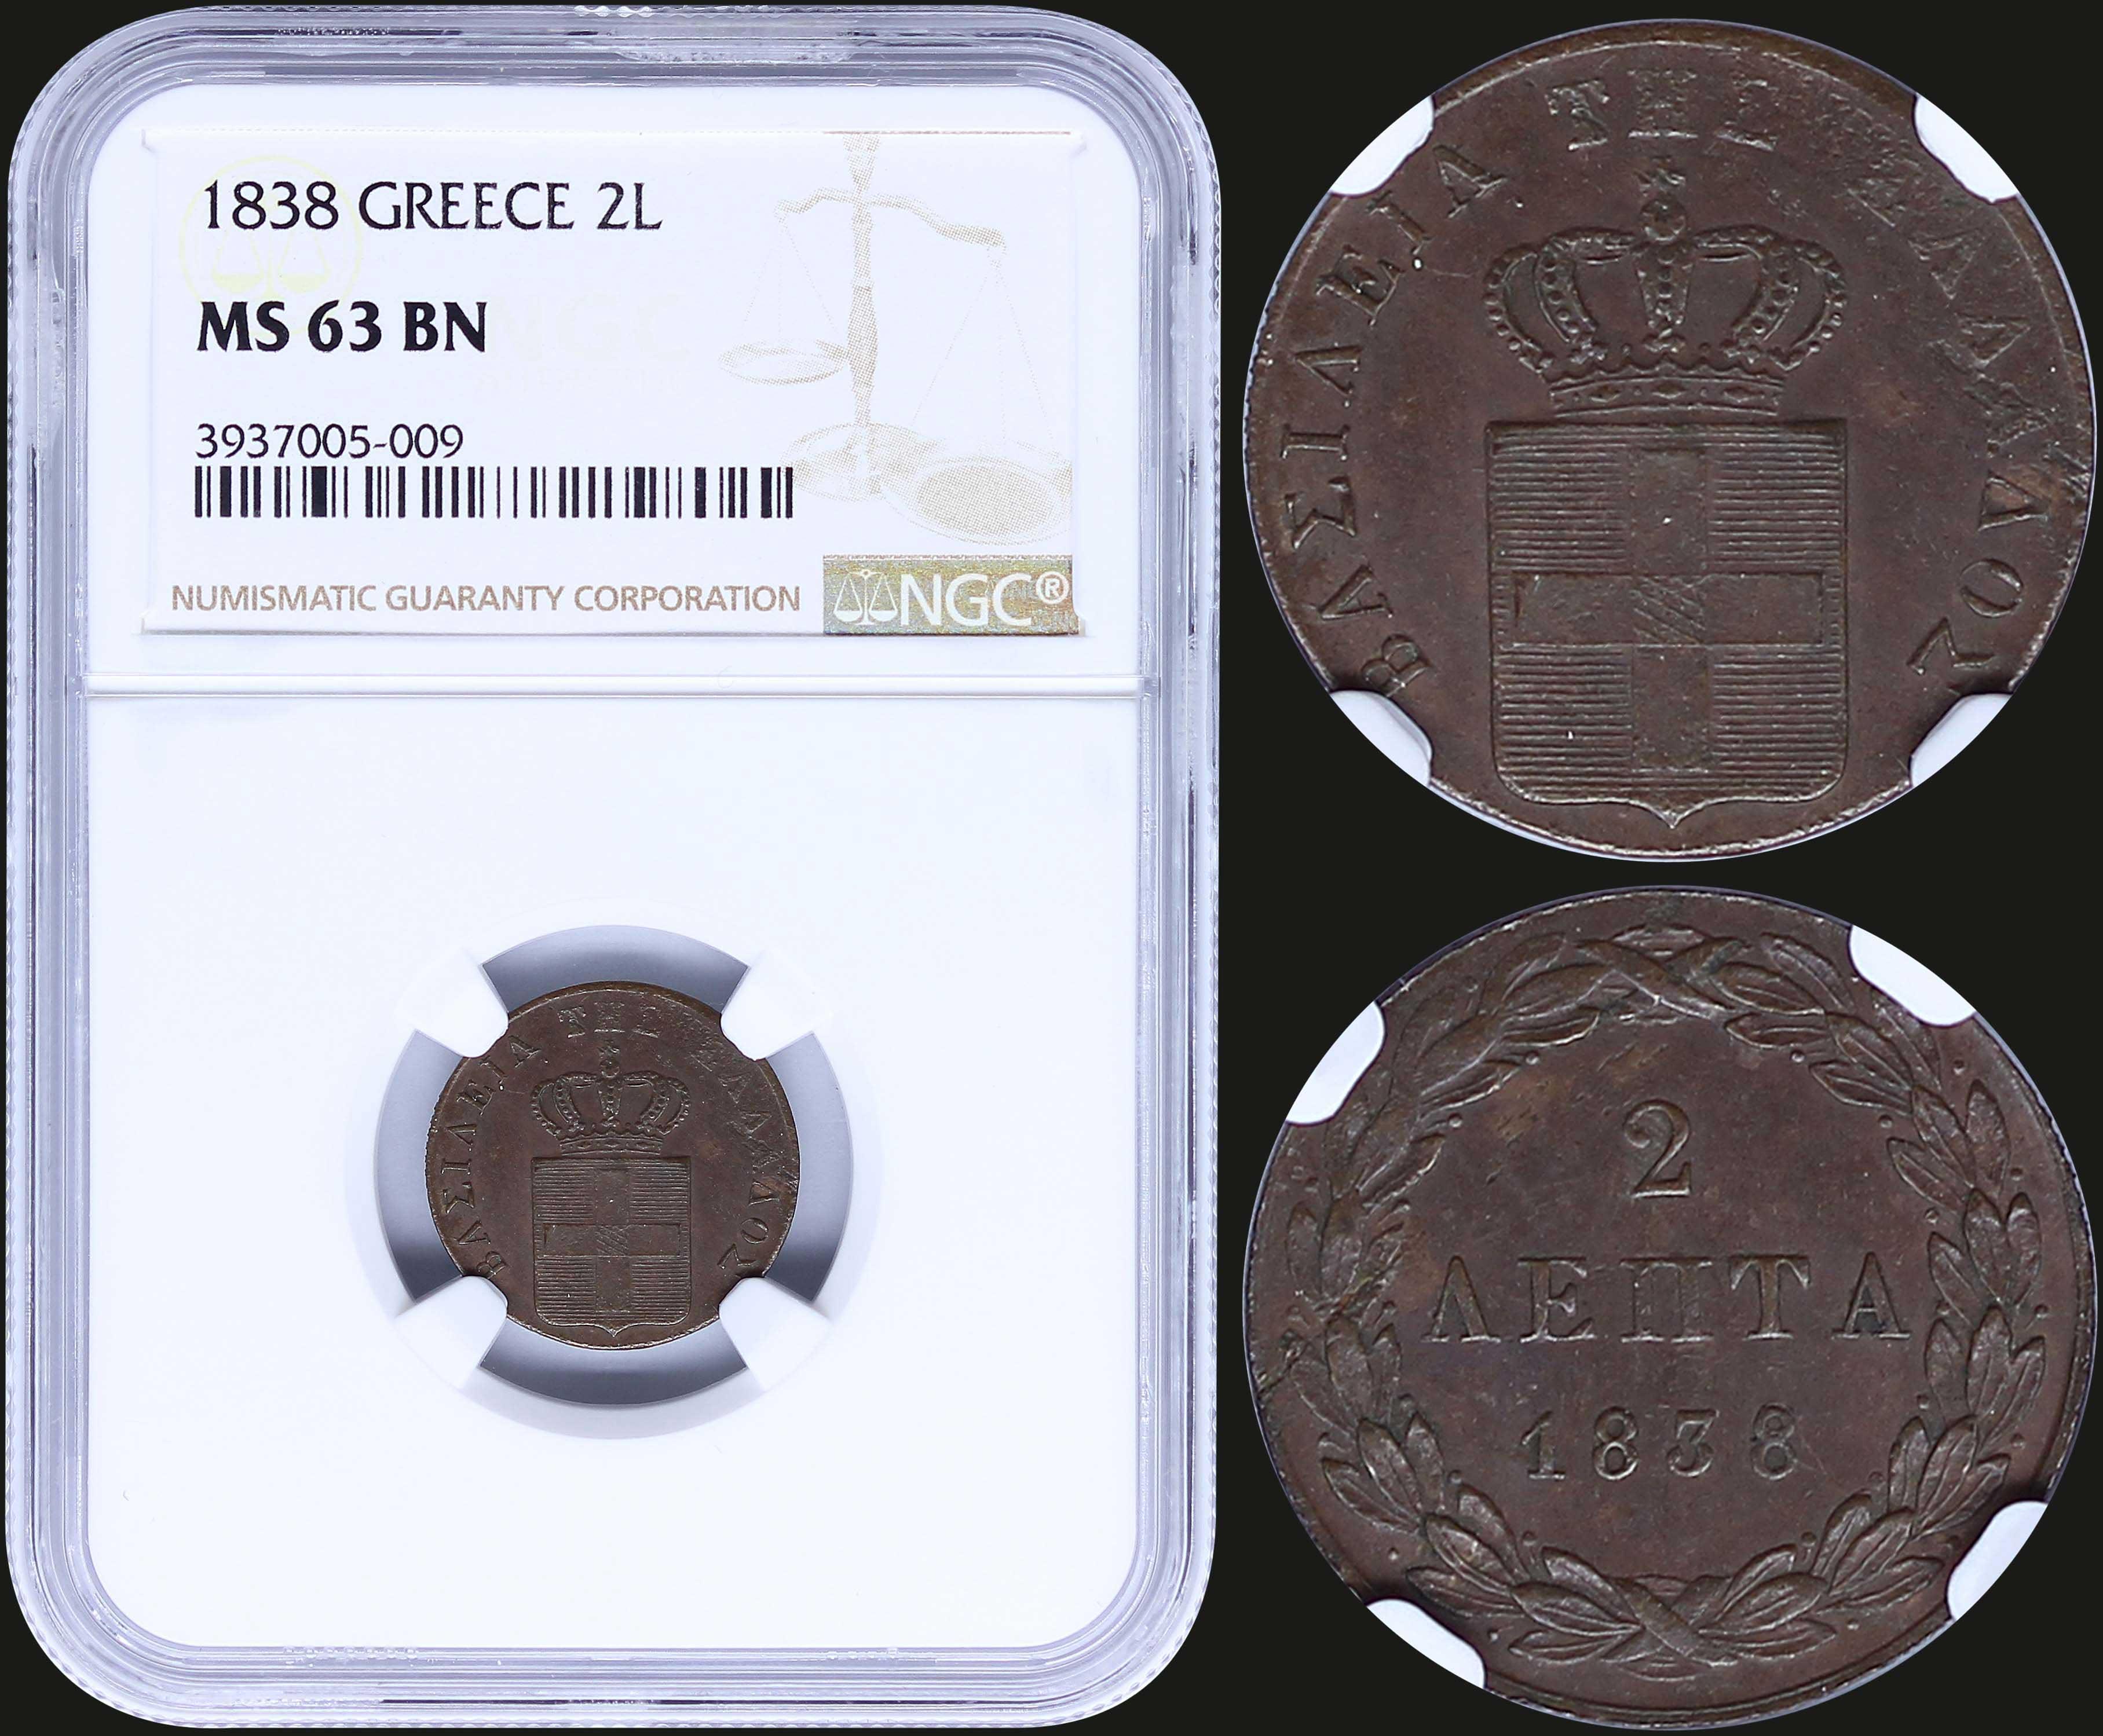 Lot 8091 - -  COINS & TOKENS king otto -  A. Karamitsos Public & Live Bid Auction 644 Coins, Medals & Banknotes